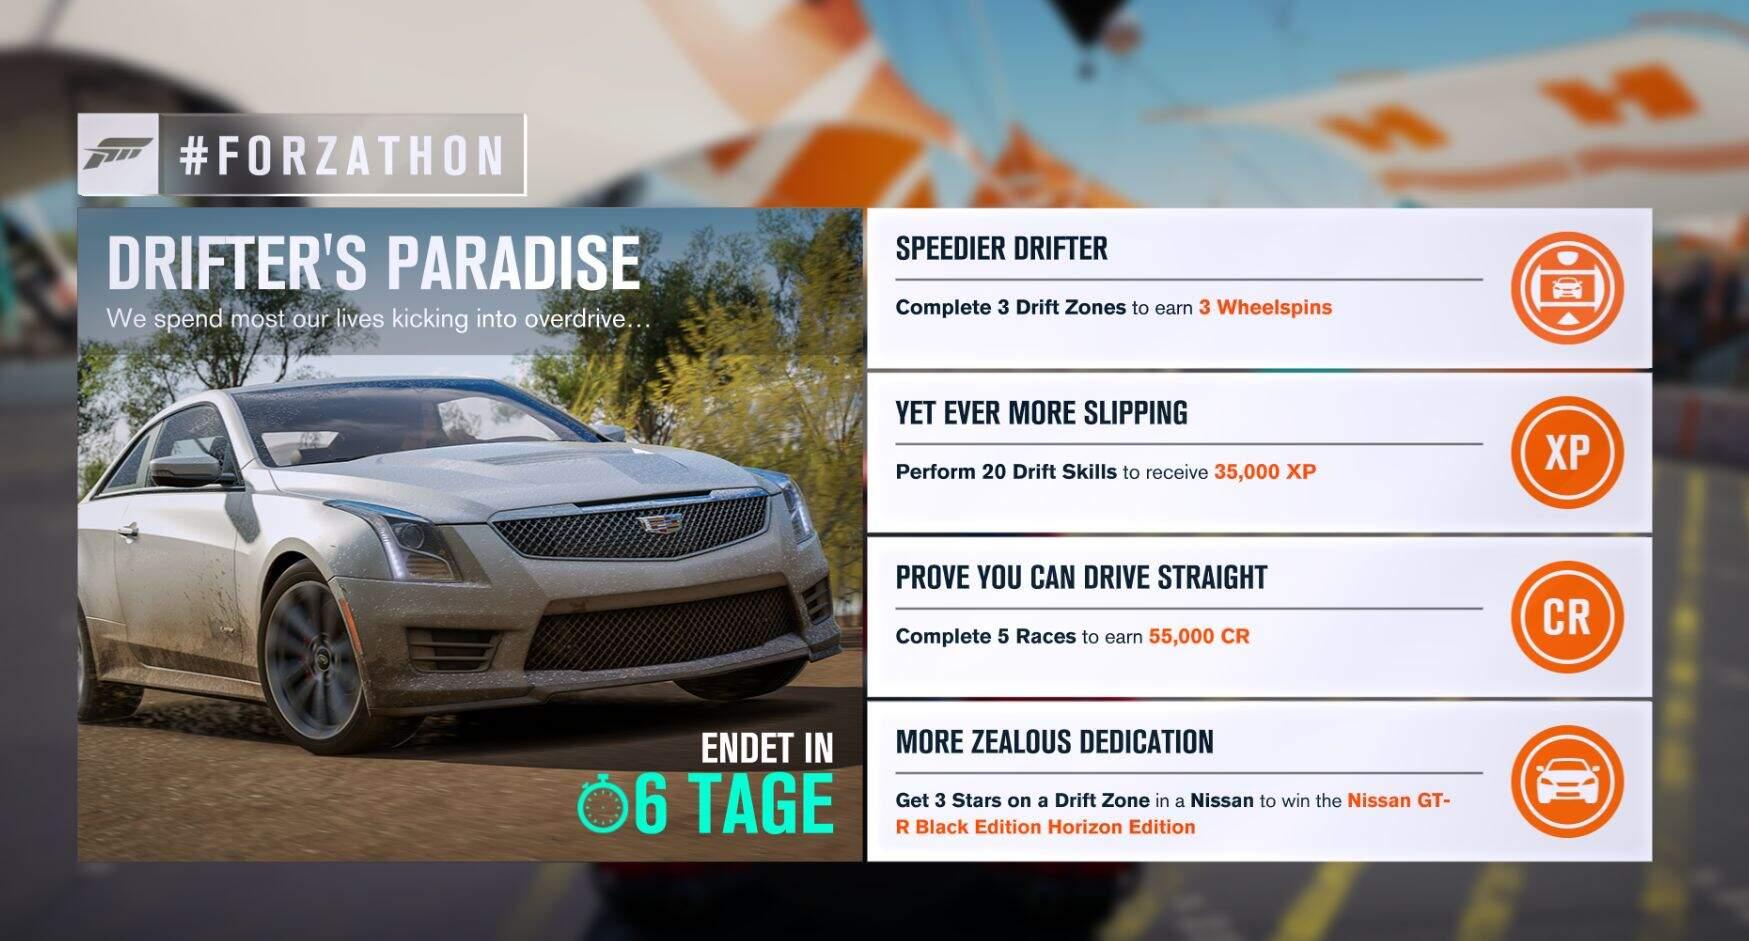 Forza Horizon 3 #Forzathon Guide KW 44 – Drifter's Paradise